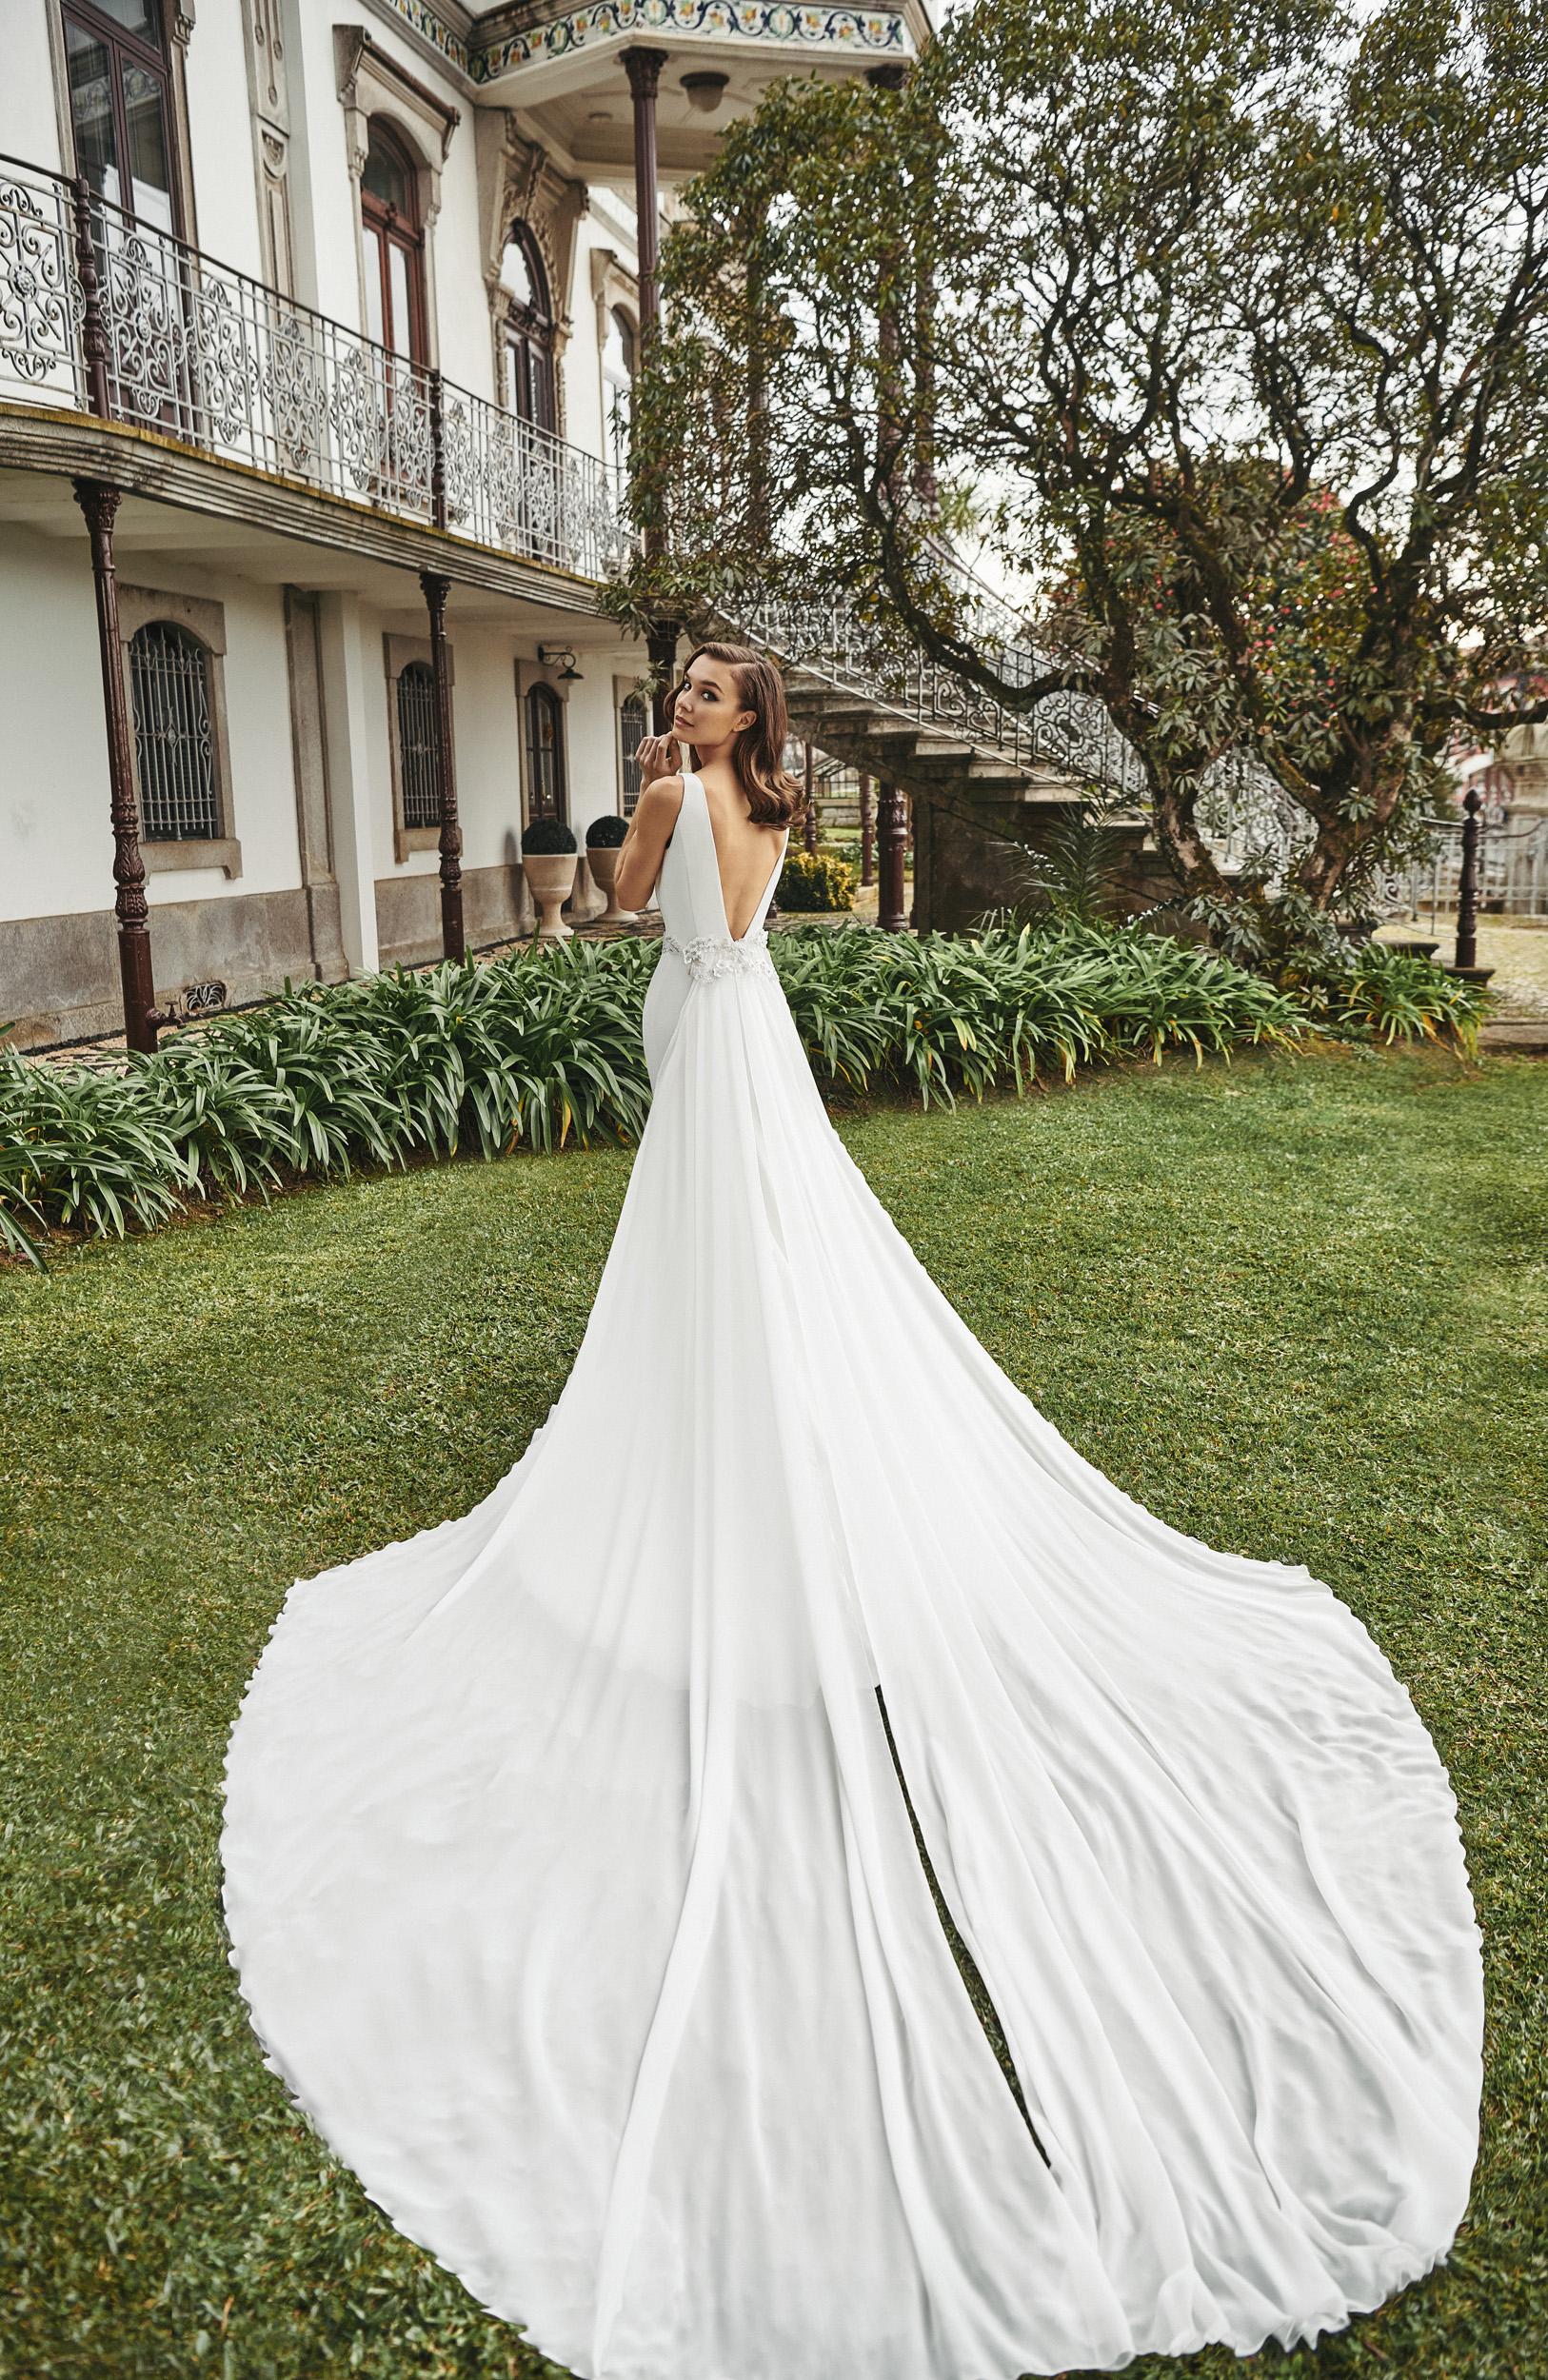 Vestido de novia 2021 - Lago - detras